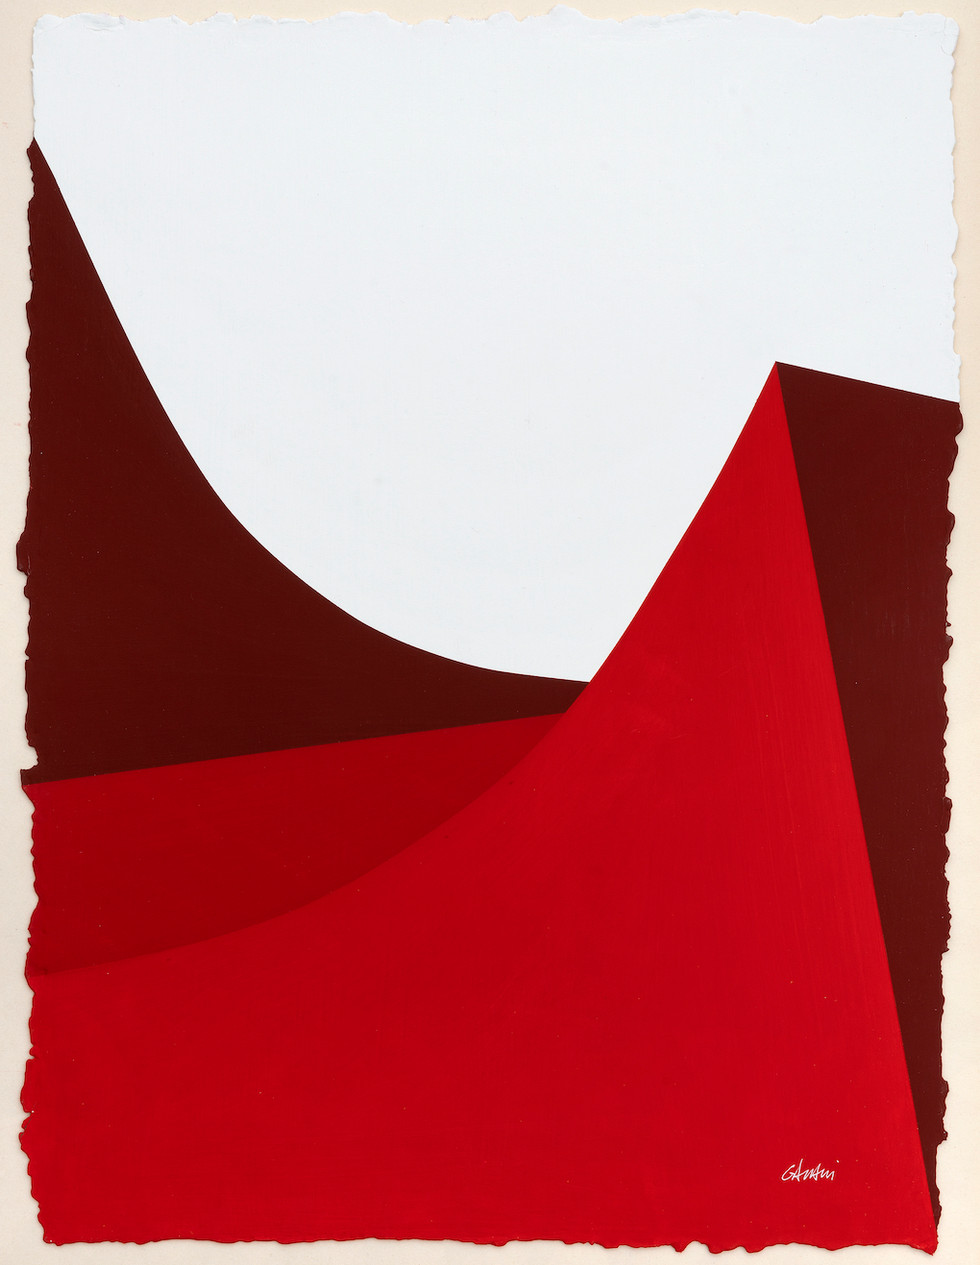 Lignes urbaines rouge 2 2019 Acryl auf handgeschöpftem Papier 52 x 38 cm